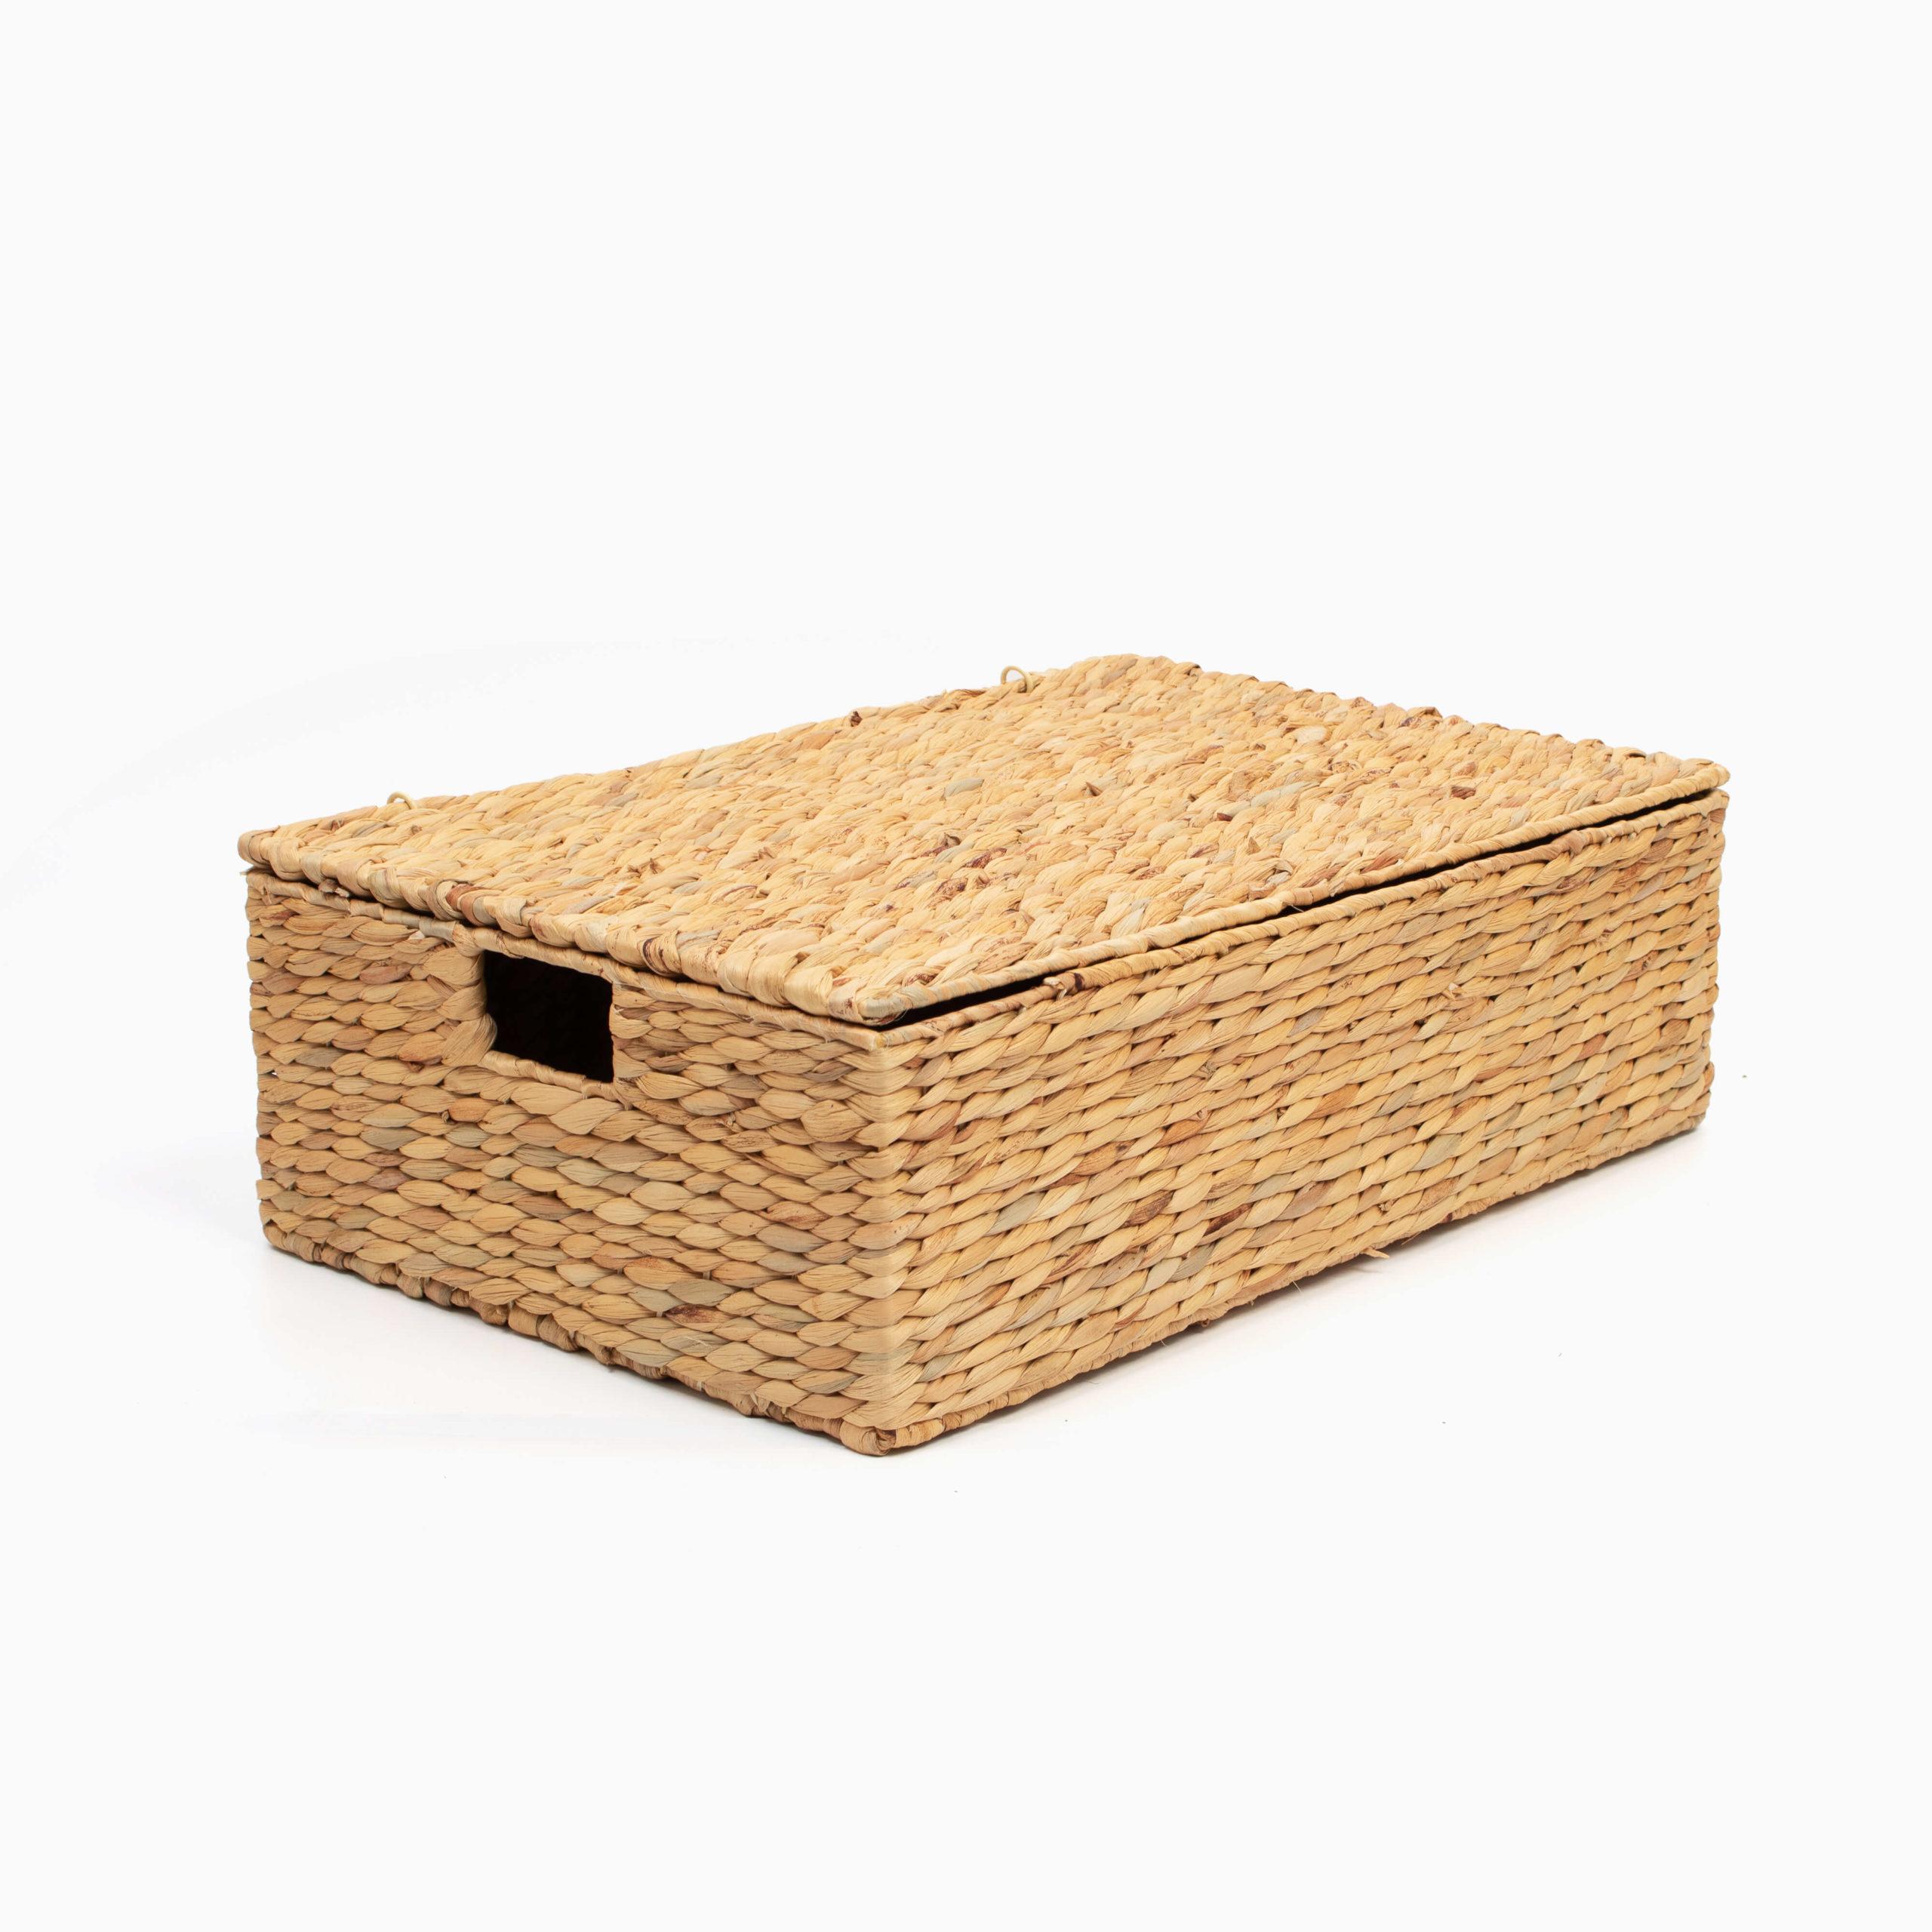 Sustainable, Rectangular Storage & laundry baskets made of Water Hyacinth